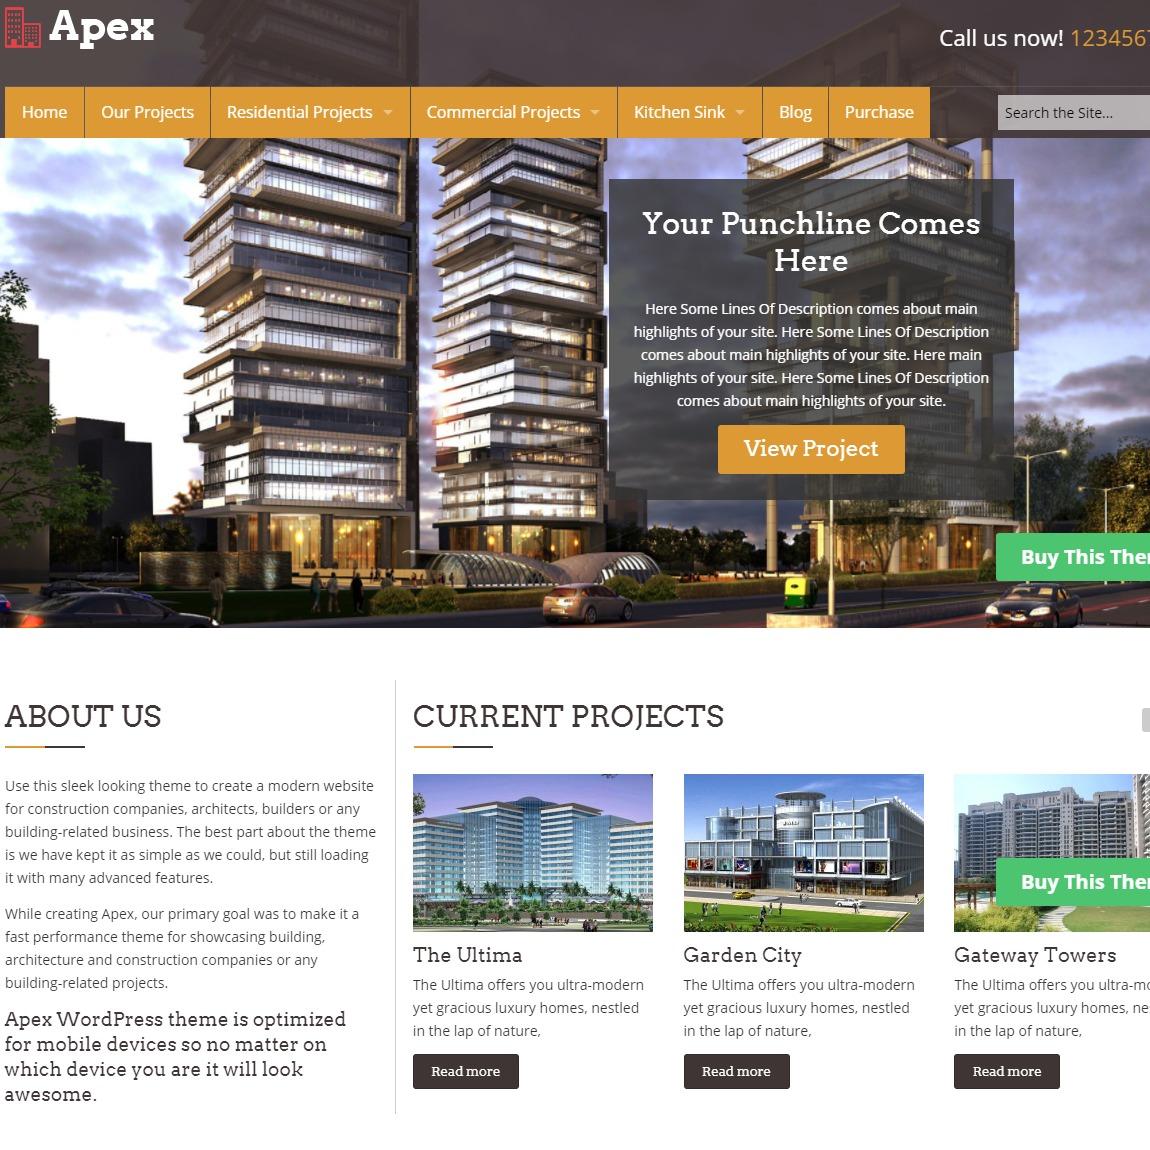 apex-WordPress-construction-theme